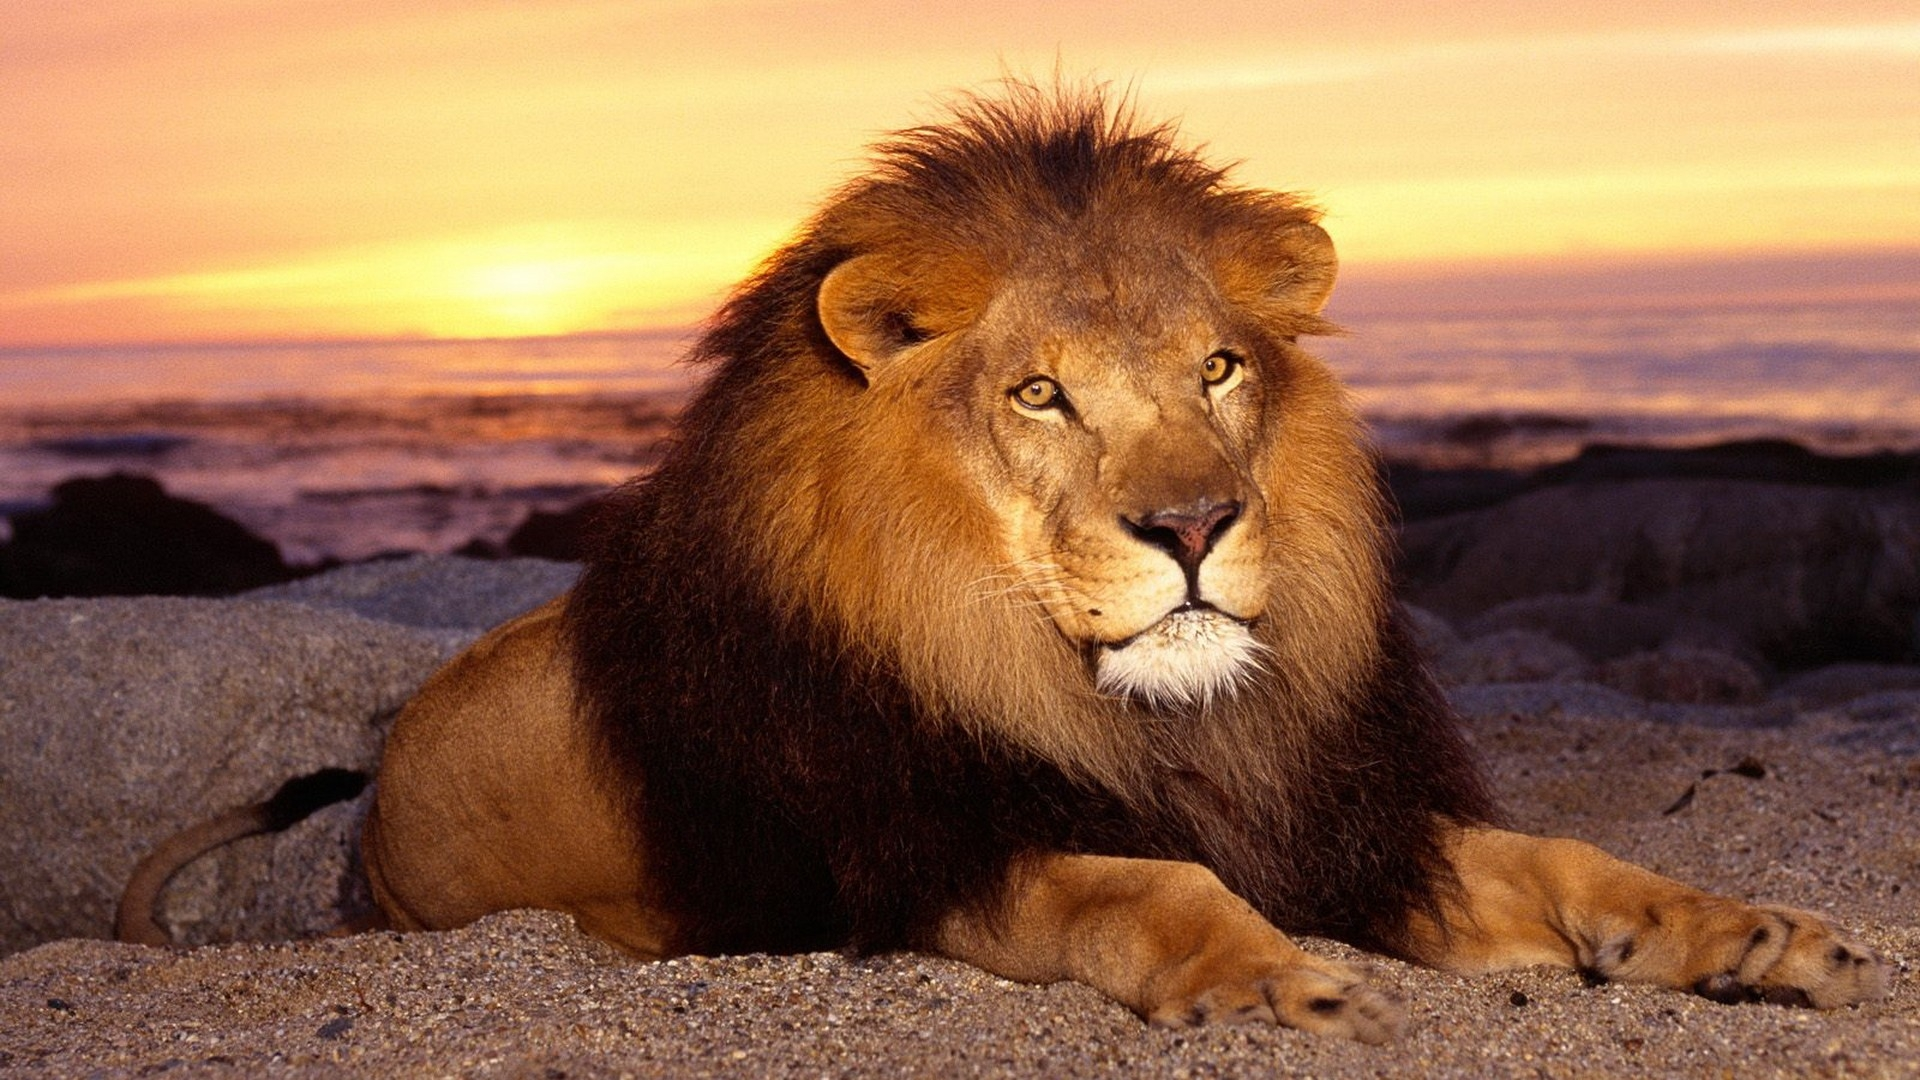 download wallpaper 1920x1080 lion, mane, sand, sunset, lie full hd